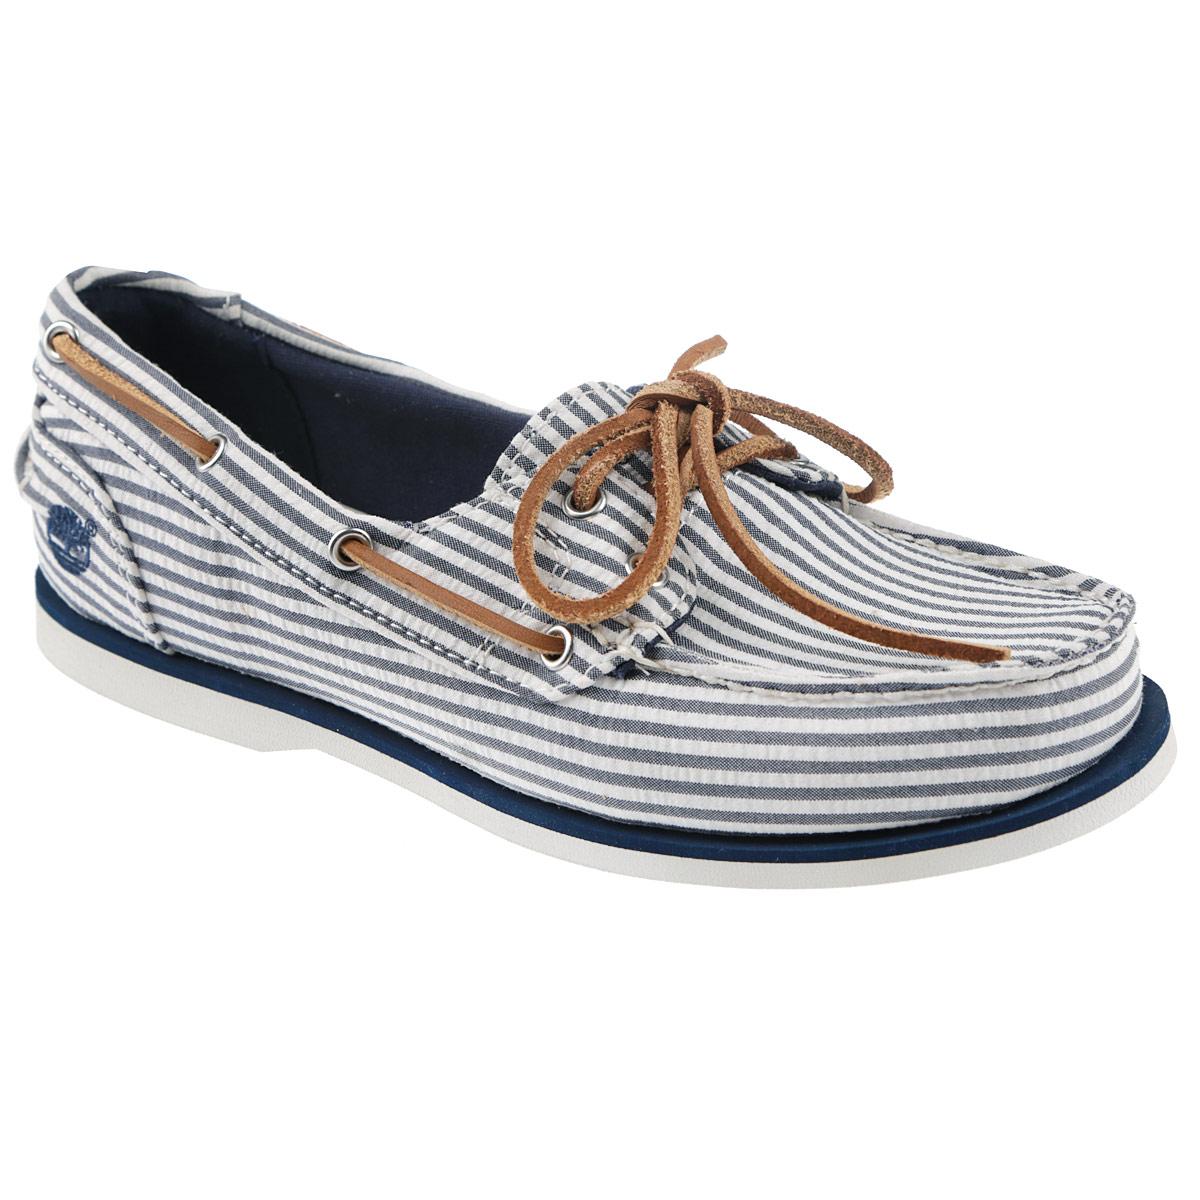 Топсайдеры женские Canvas Boat Shoe. TBL8910AW